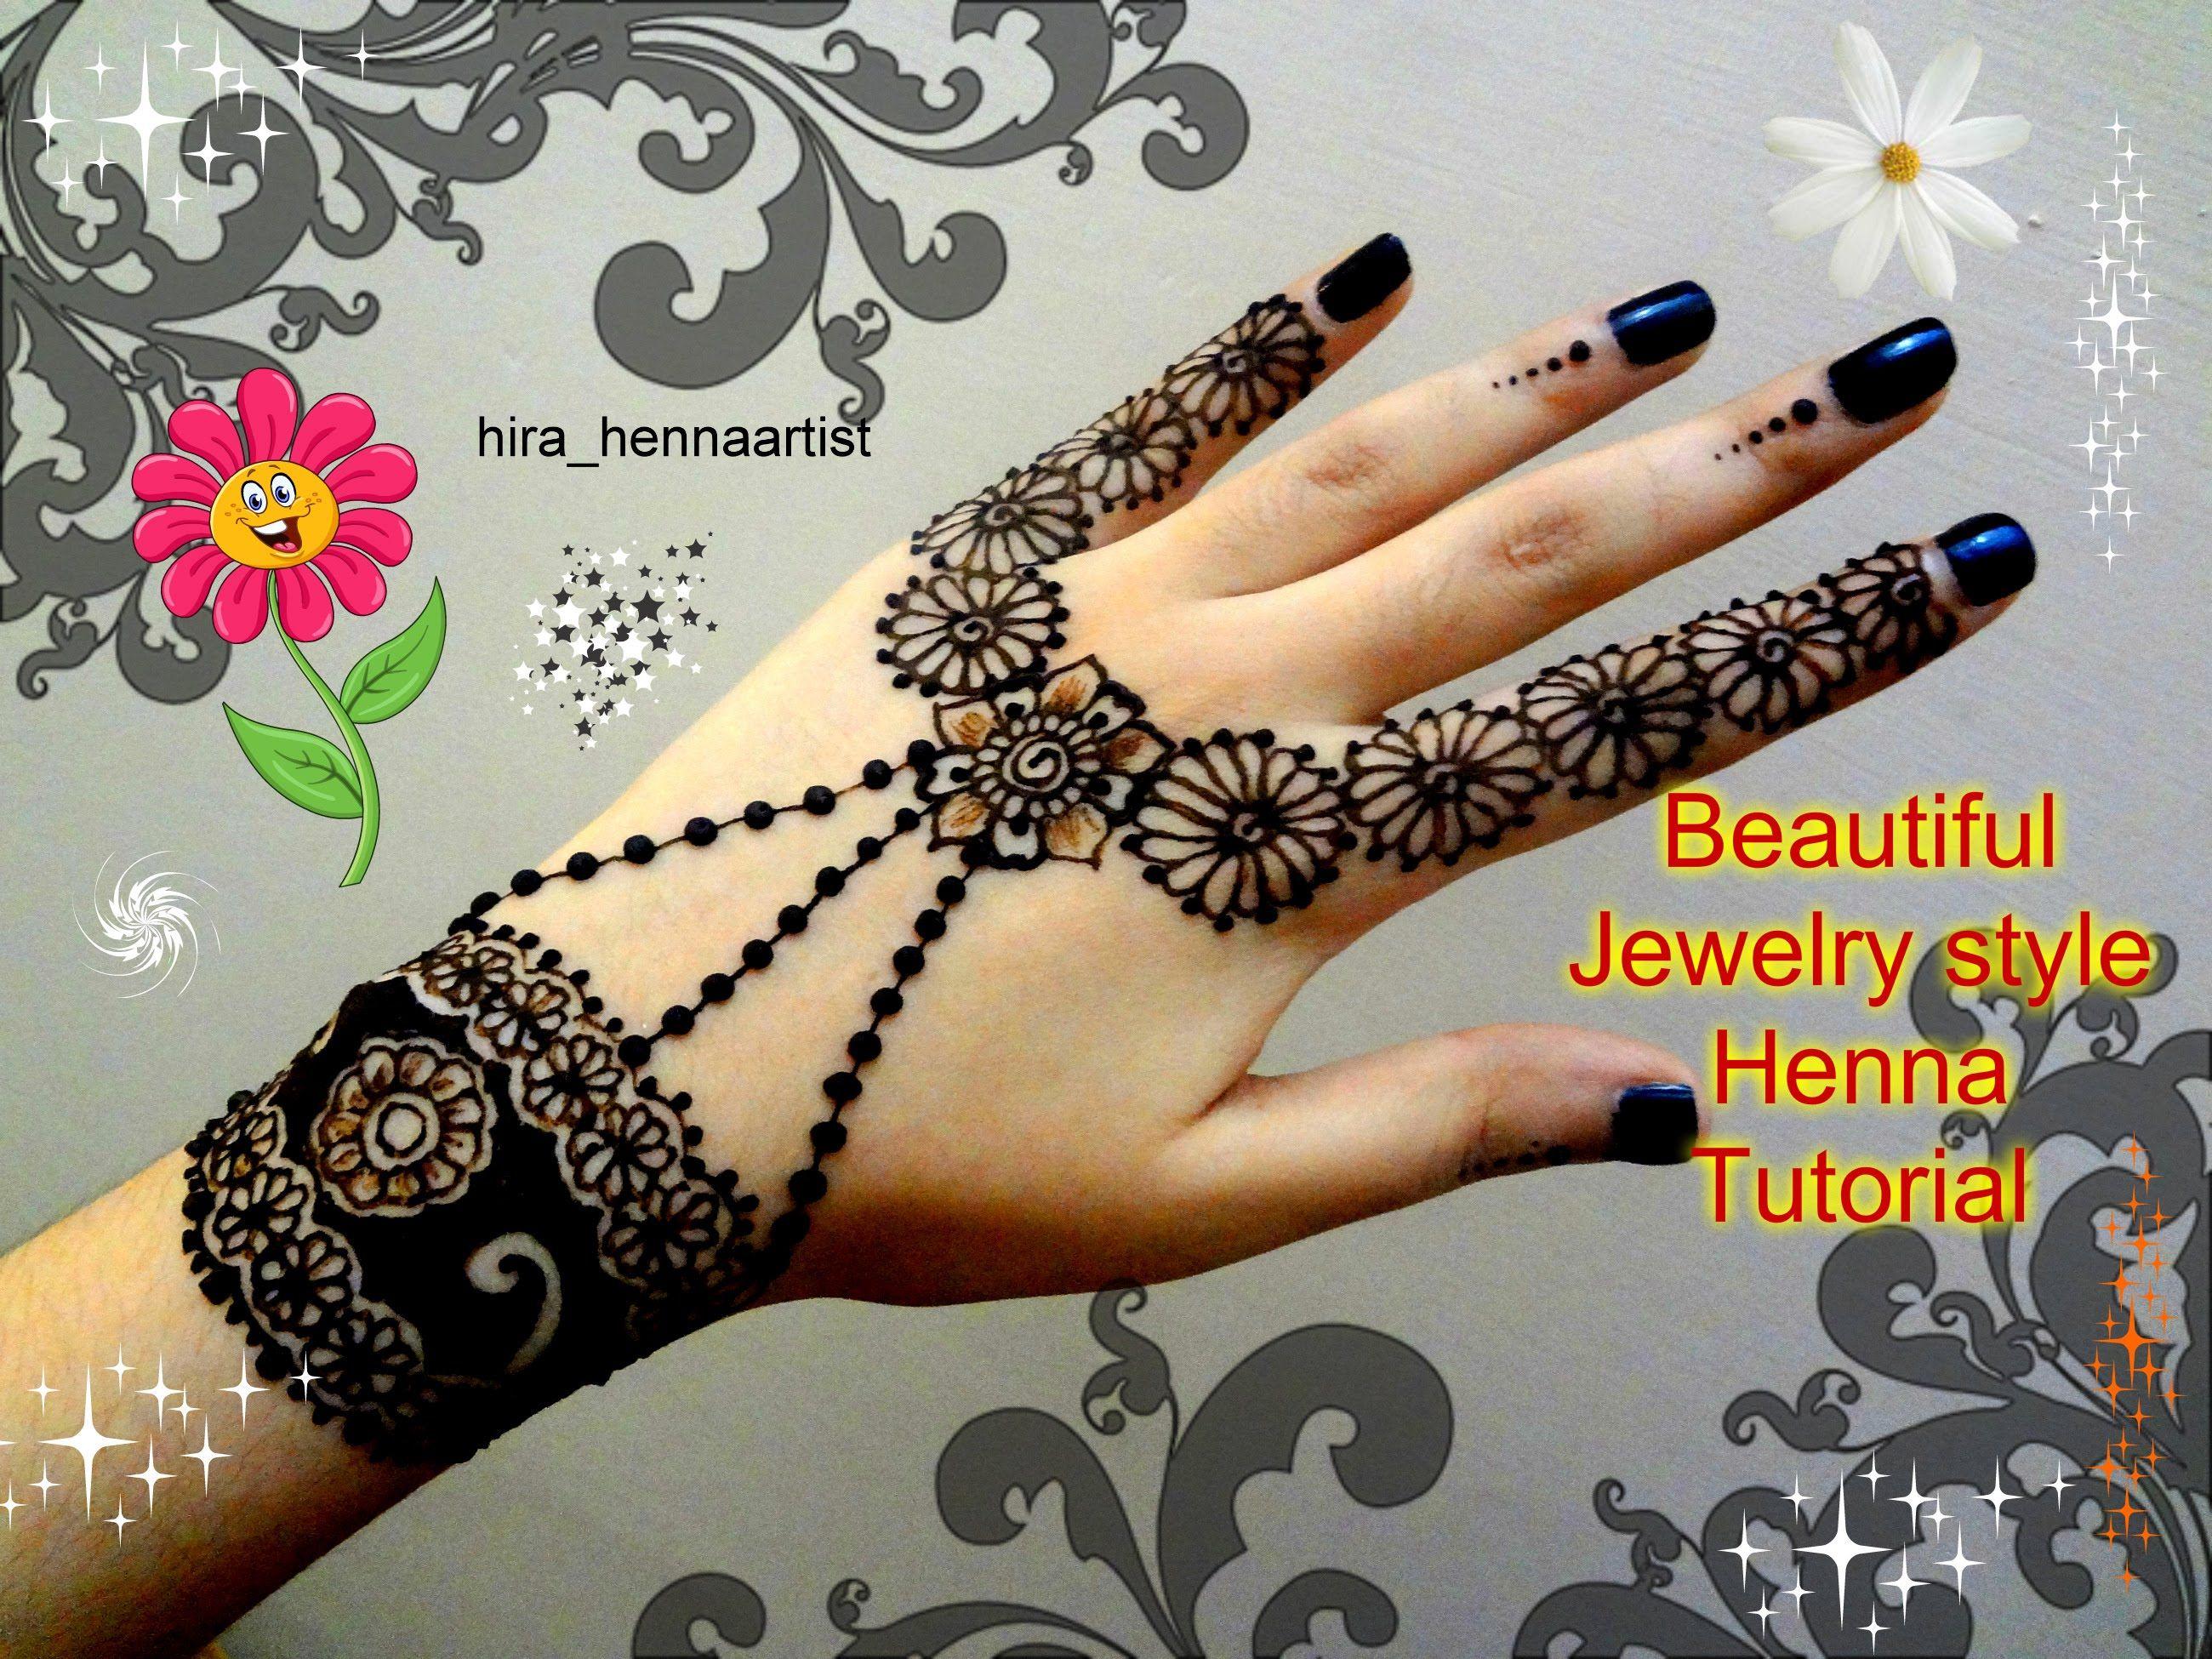 Party Mehndi Cone : Henna diy beautiful jewelry inspired mehndi tutorial for eid